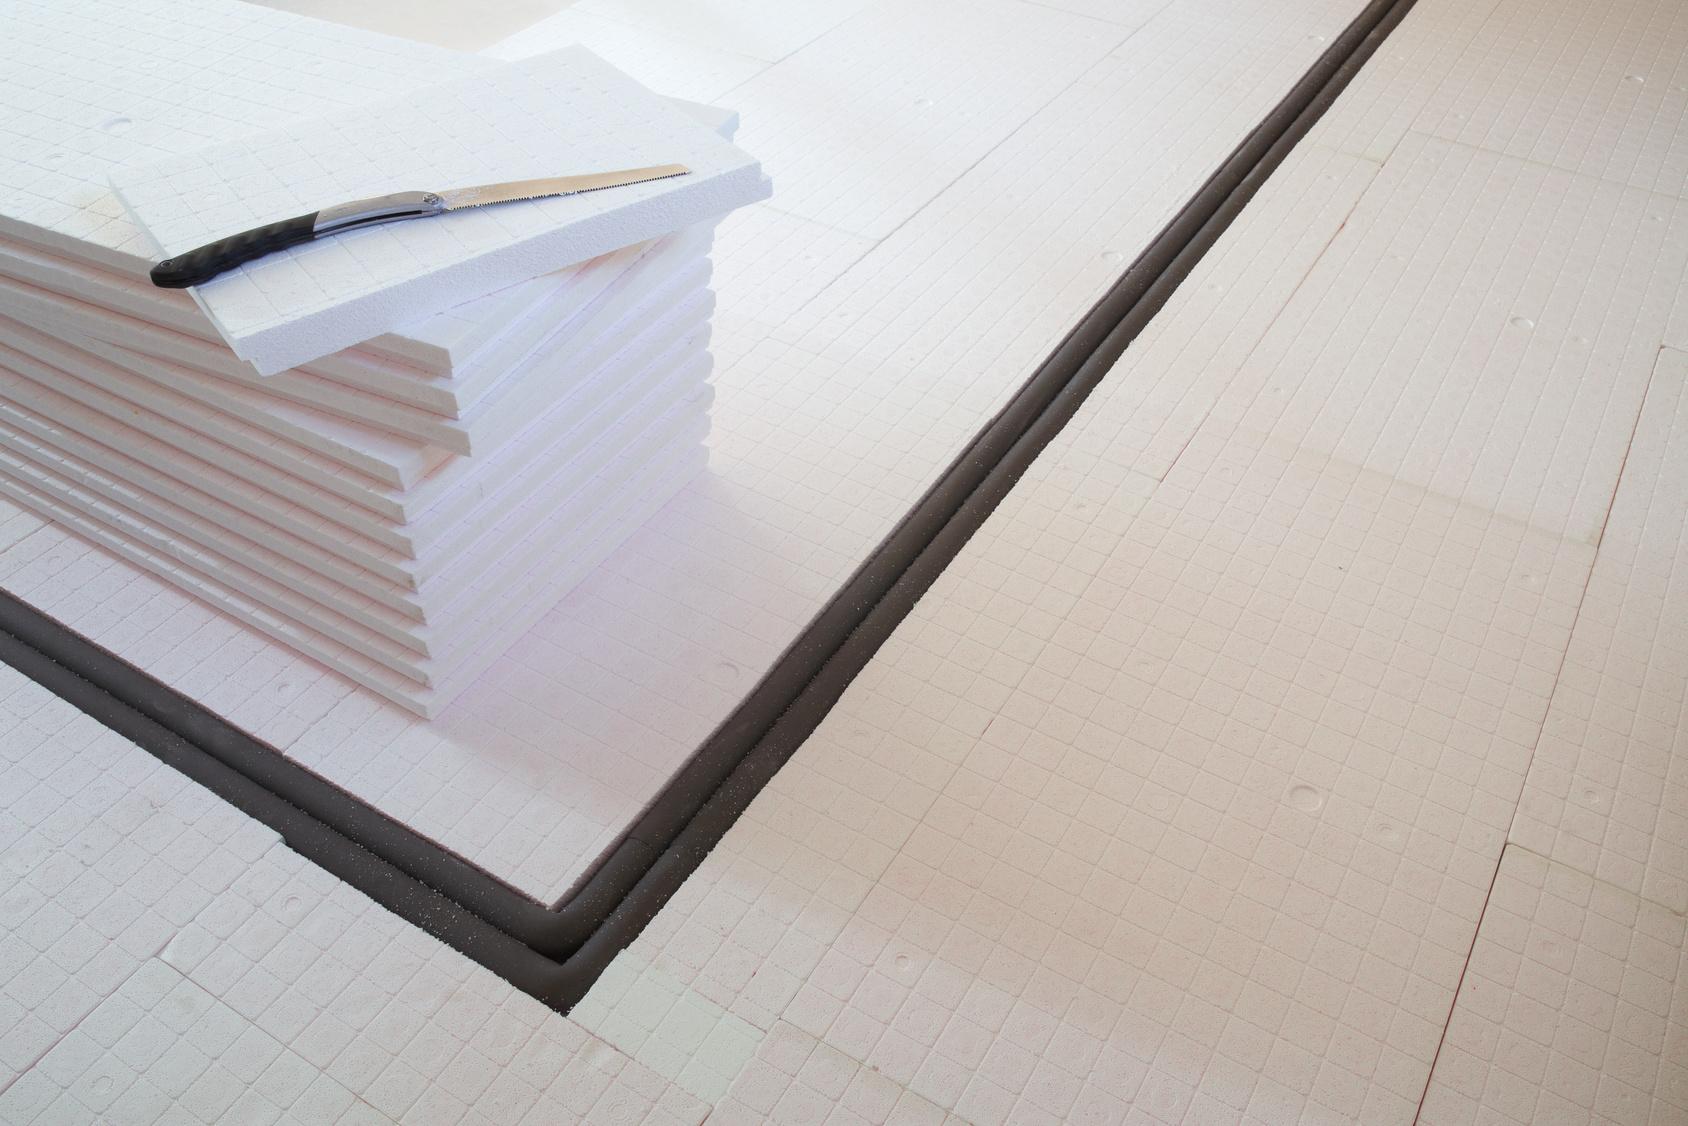 fuboden dmmen dach dachboden dmmen selber machen anleitung diy with fuboden dmmen top fuboden. Black Bedroom Furniture Sets. Home Design Ideas